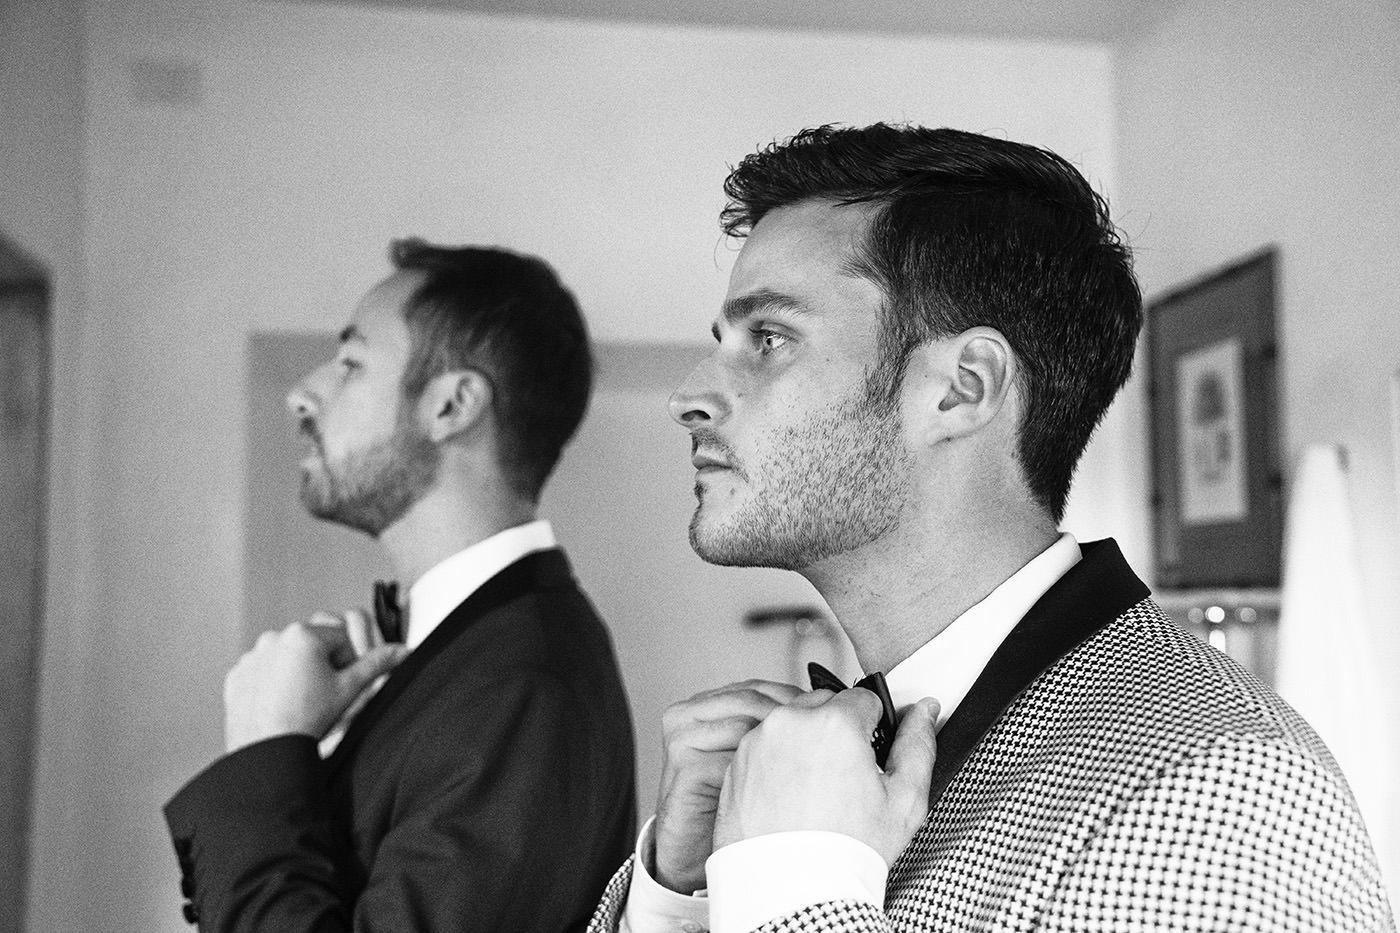 Duccio Argentini: Same-Sex Wedding Photographer. Getting ready in tuscan villa